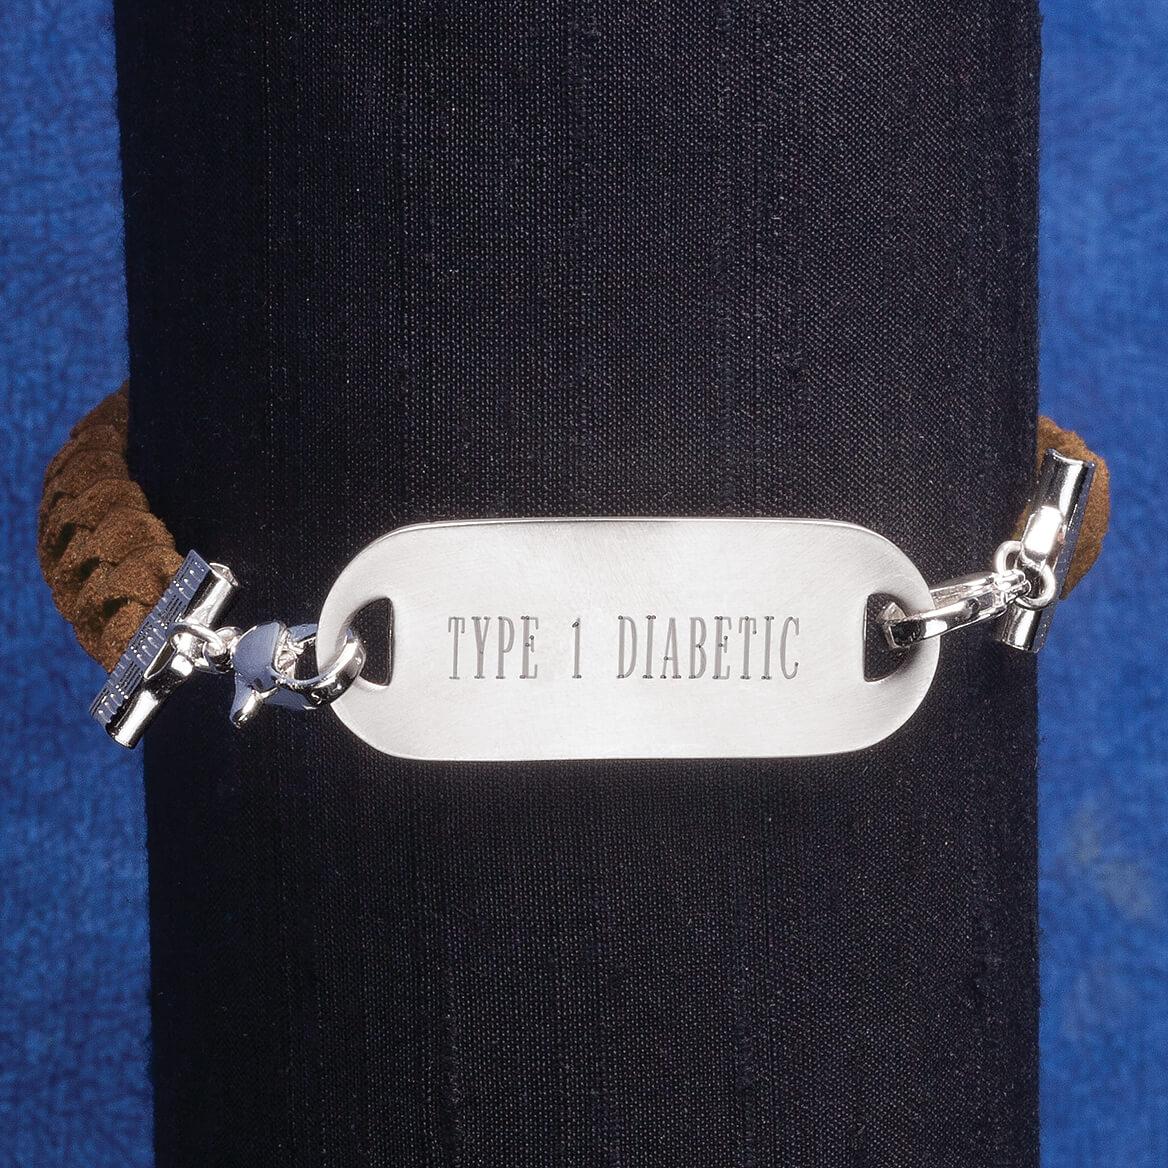 Personalized Medical ID Braided Bracelet-361638